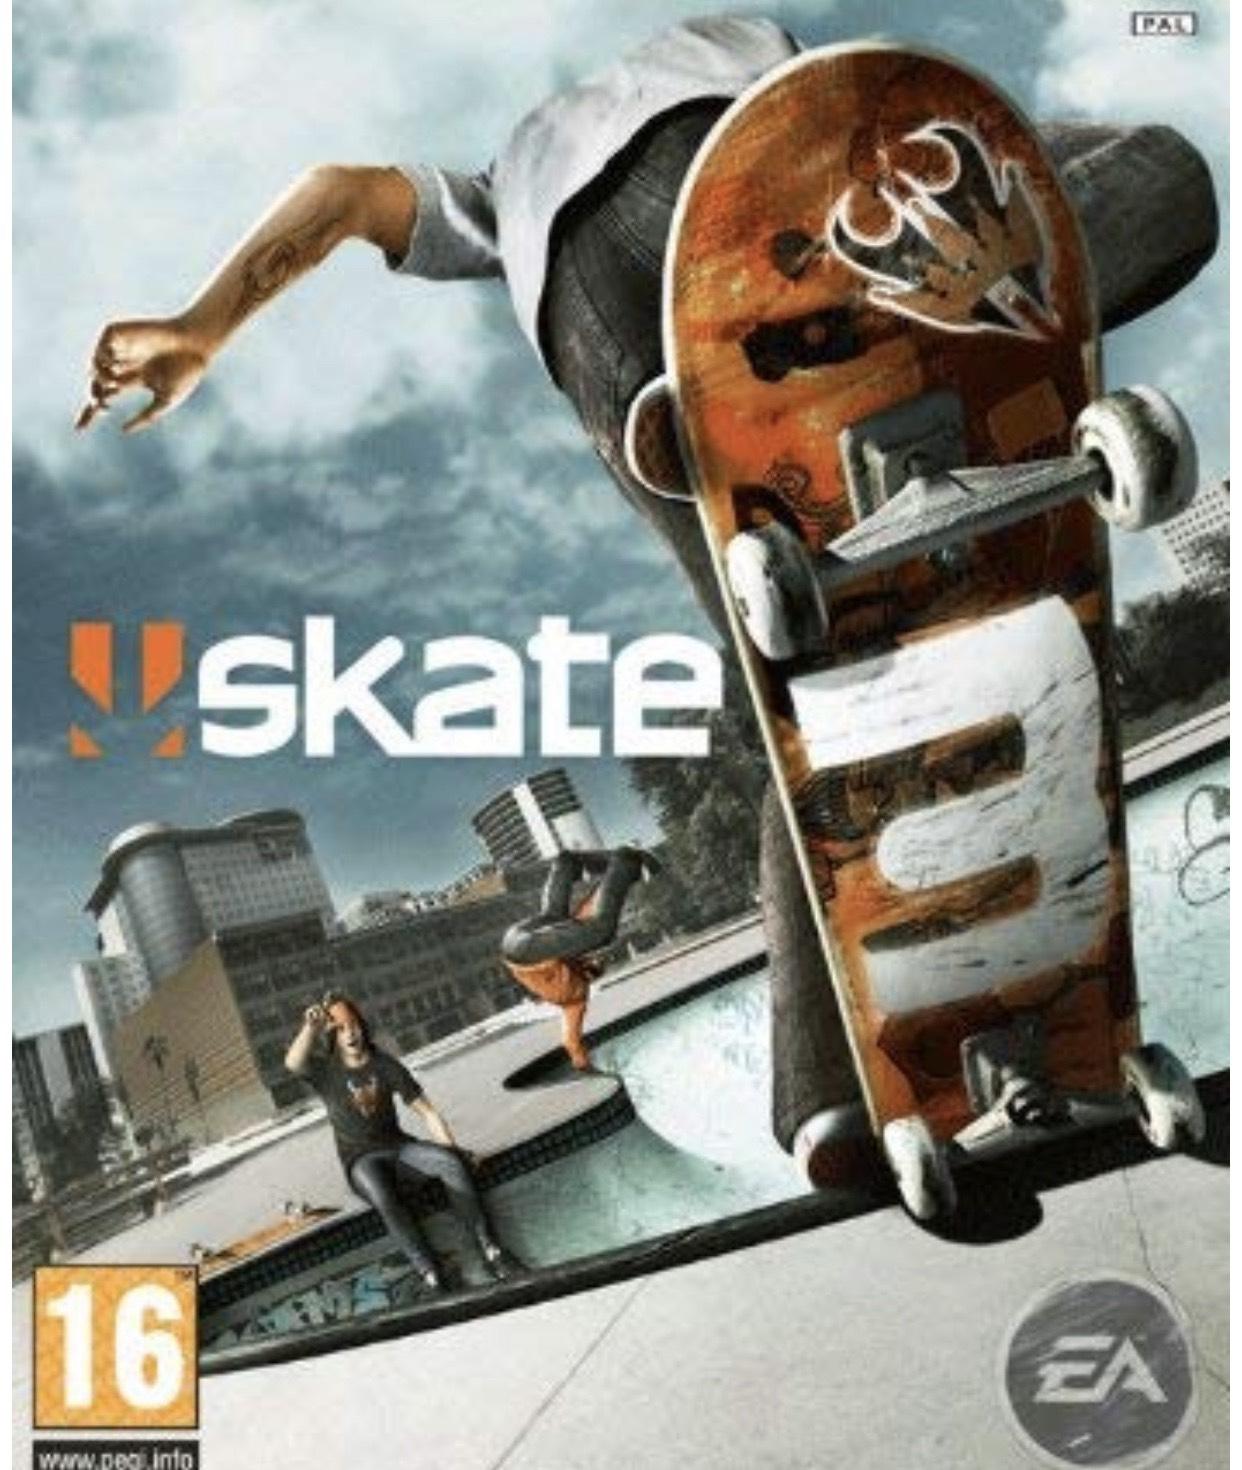 Skate 3 (Xbox 360/Xbox one) @ Microsoft store £3.74